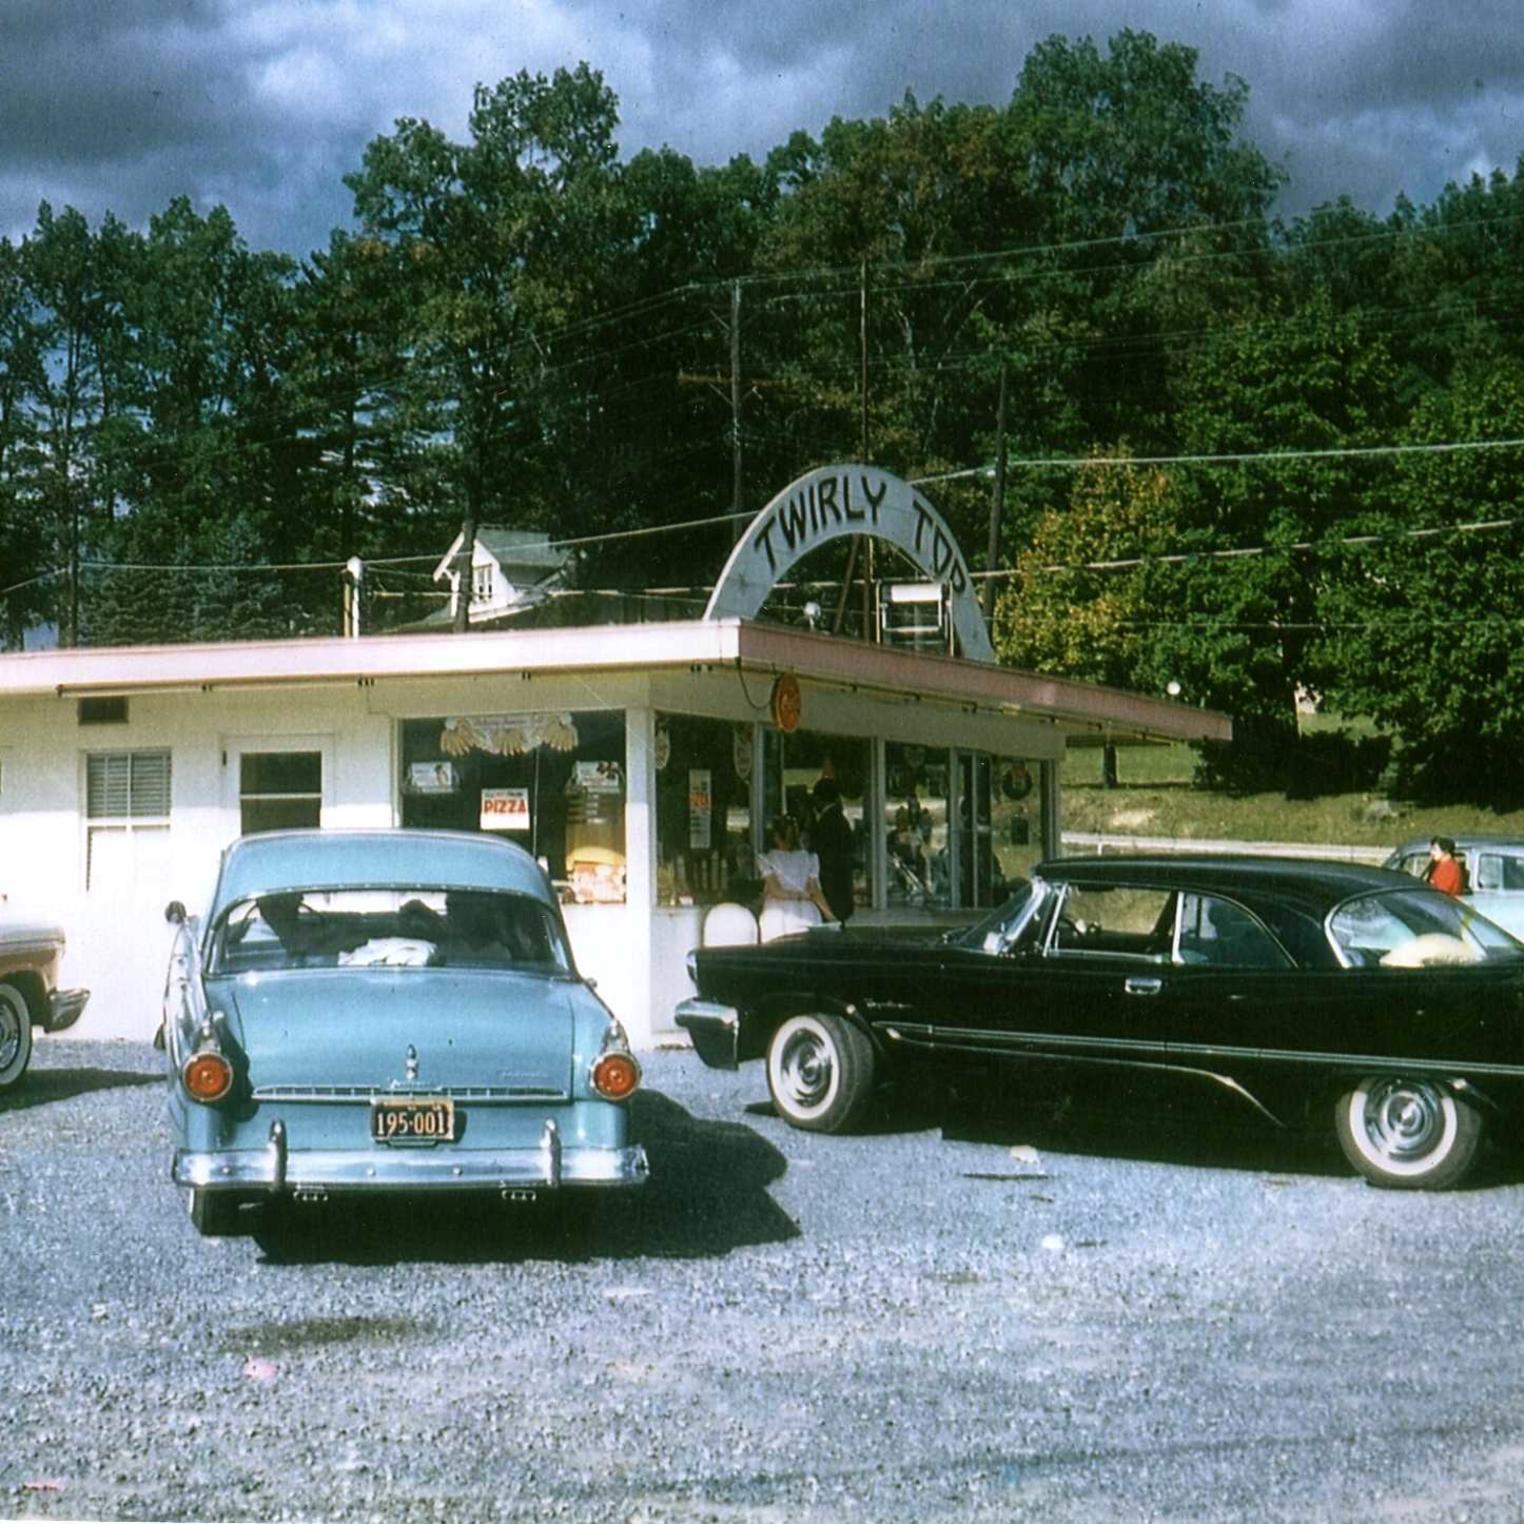 Twirly Top Circa 1950s